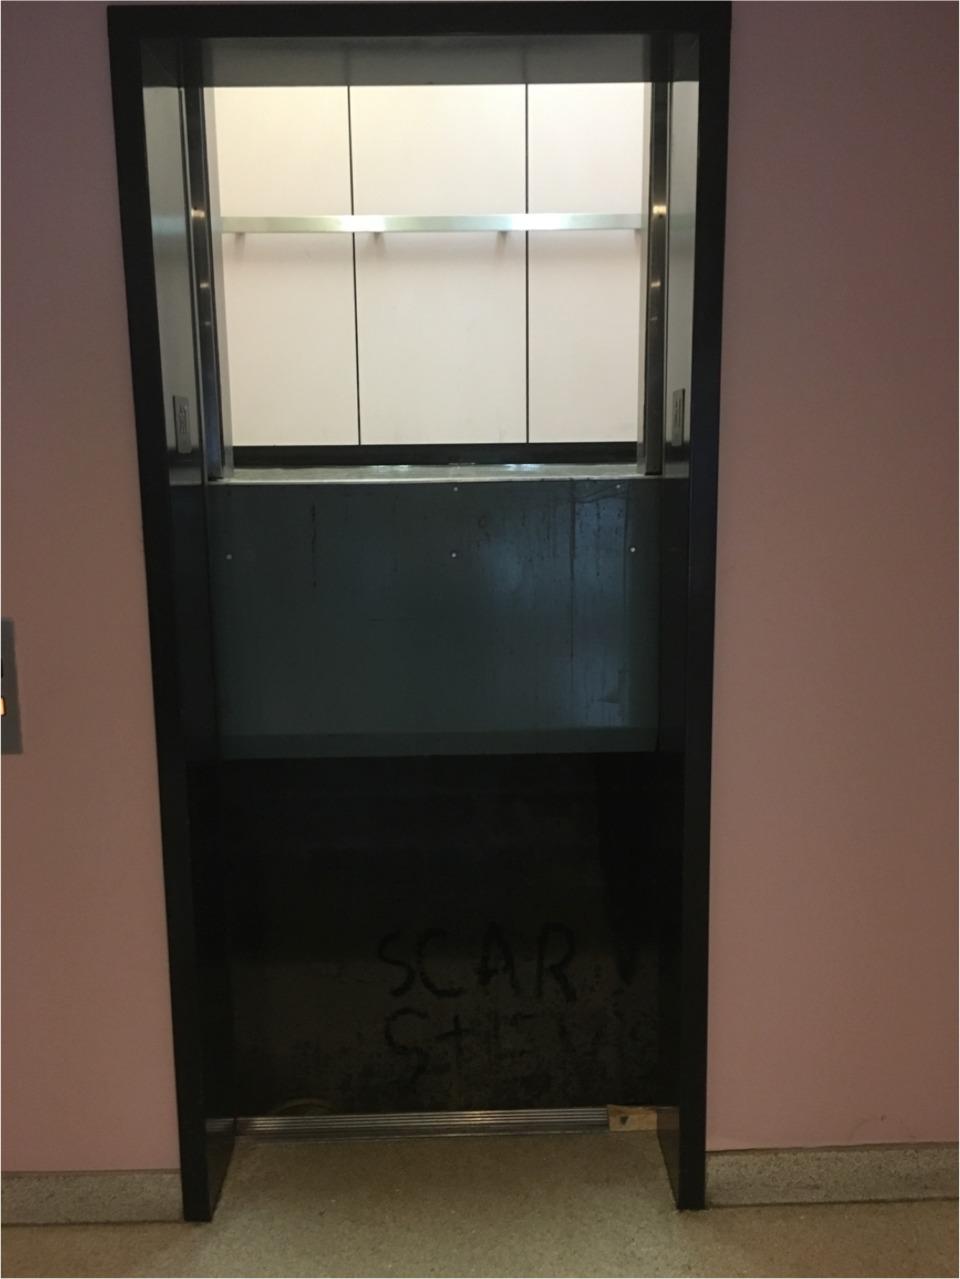 Technical Rescue Hydraulic Elevator Basics